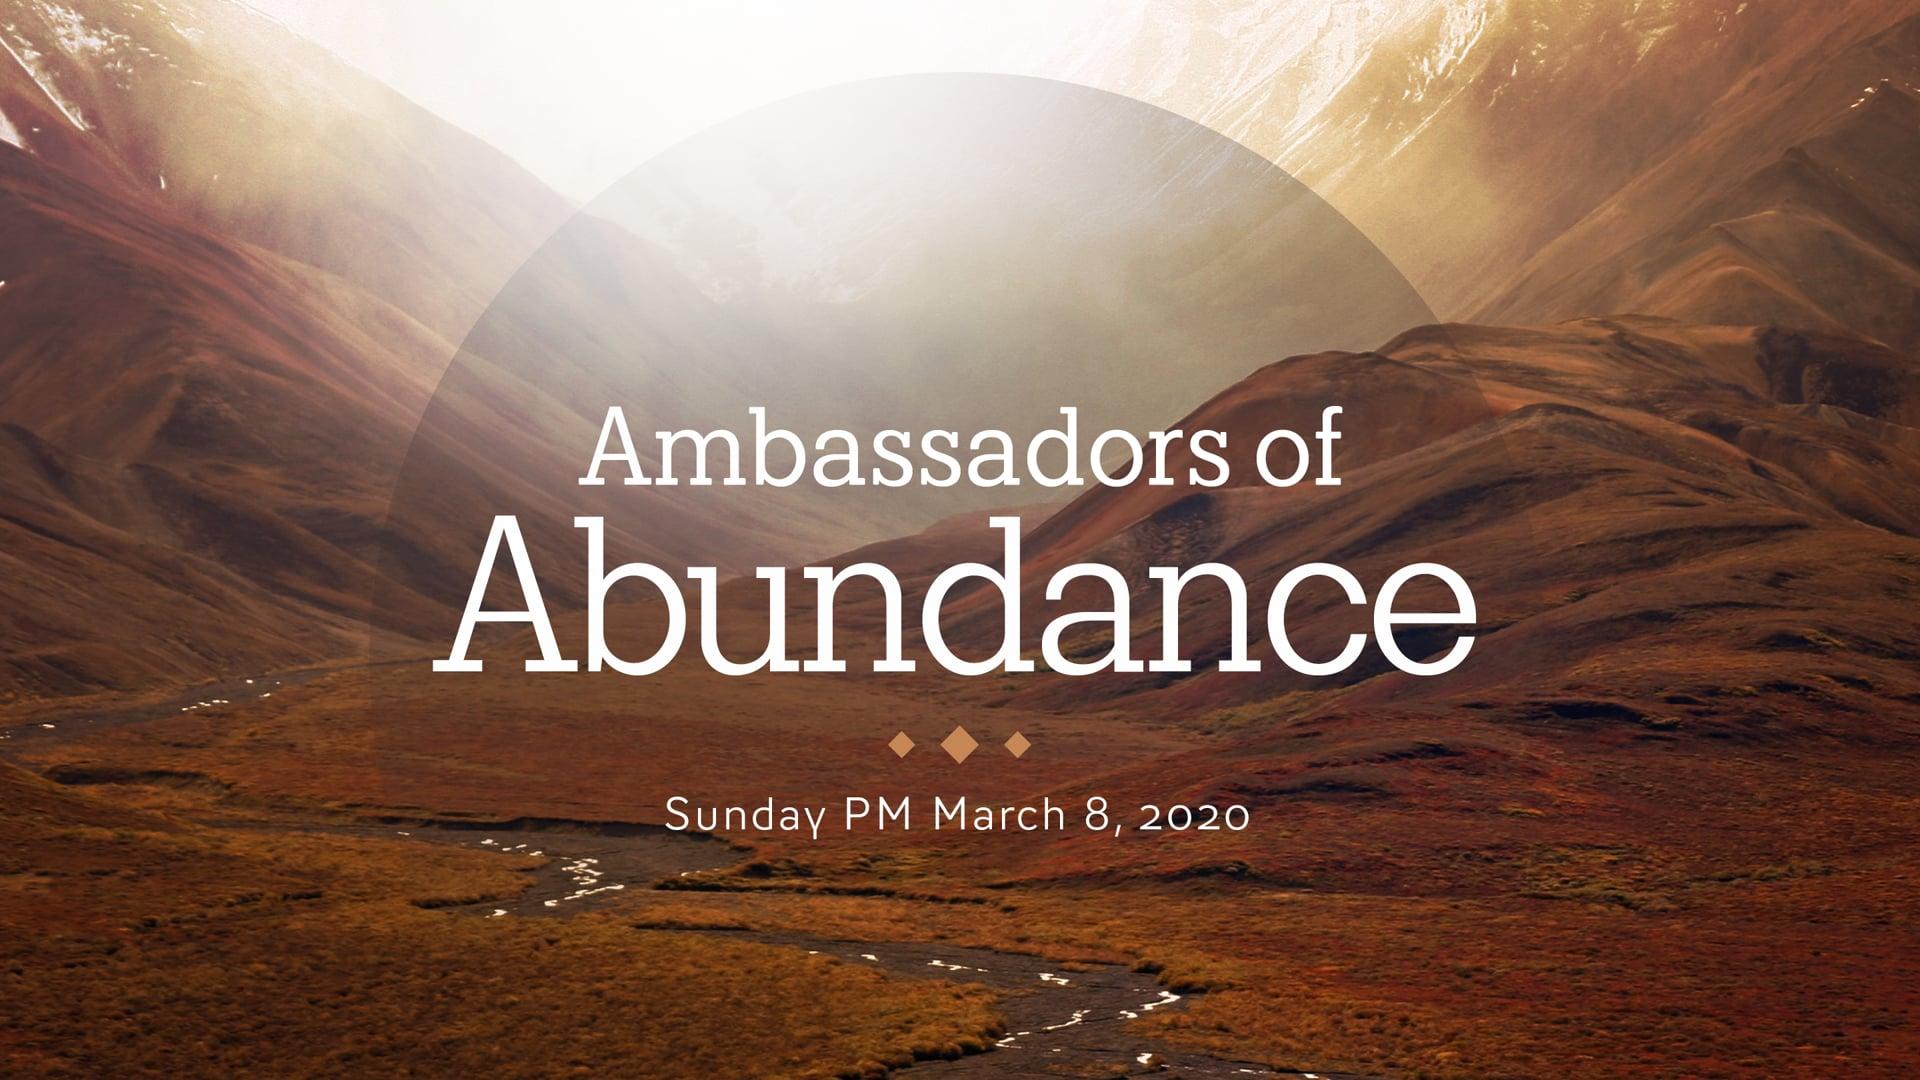 Ambassadors of Abundance